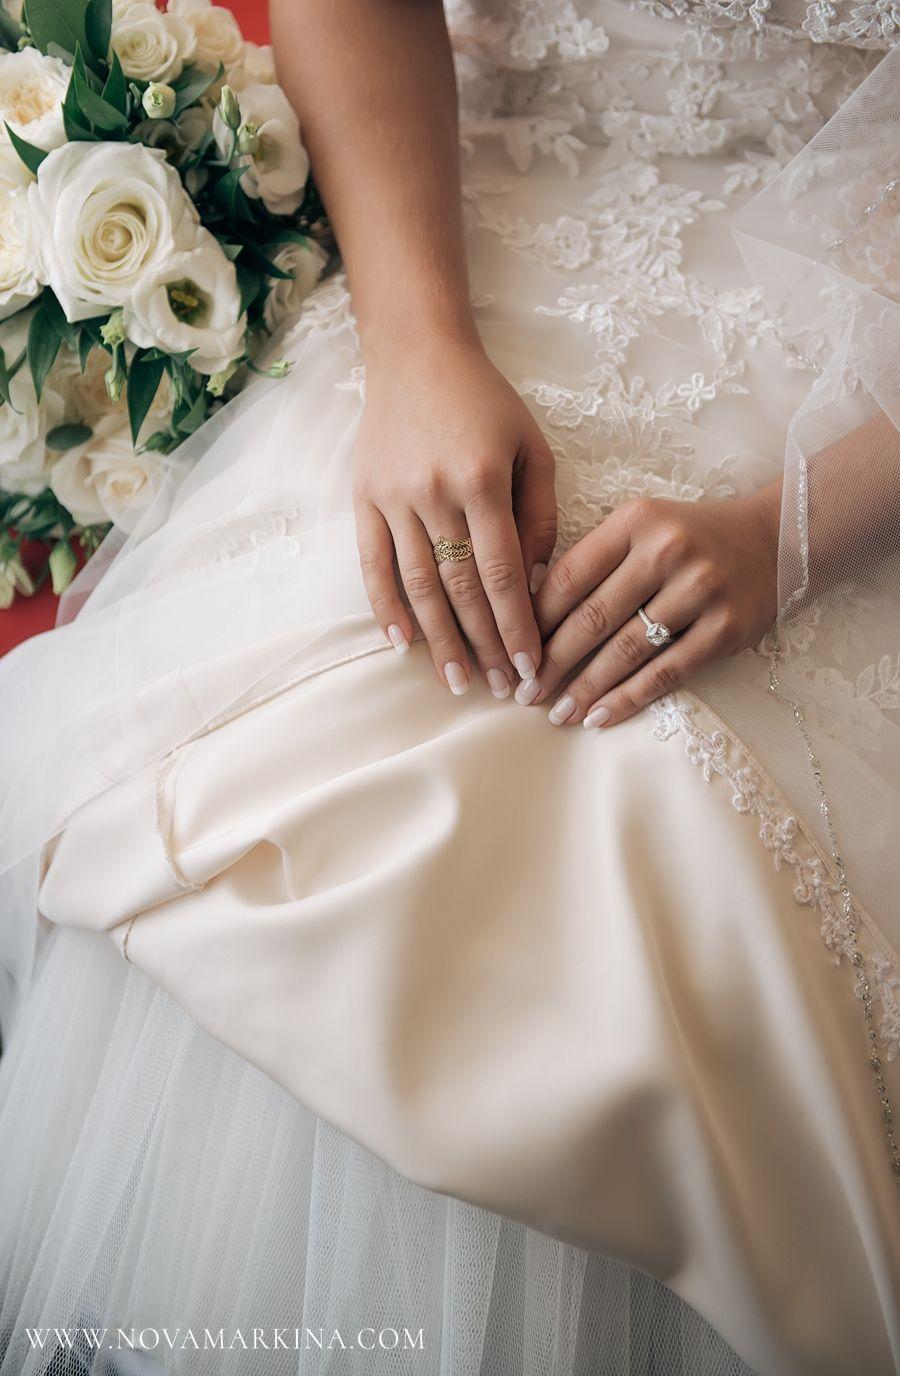 All the little details classic timeless bride bridal portrait